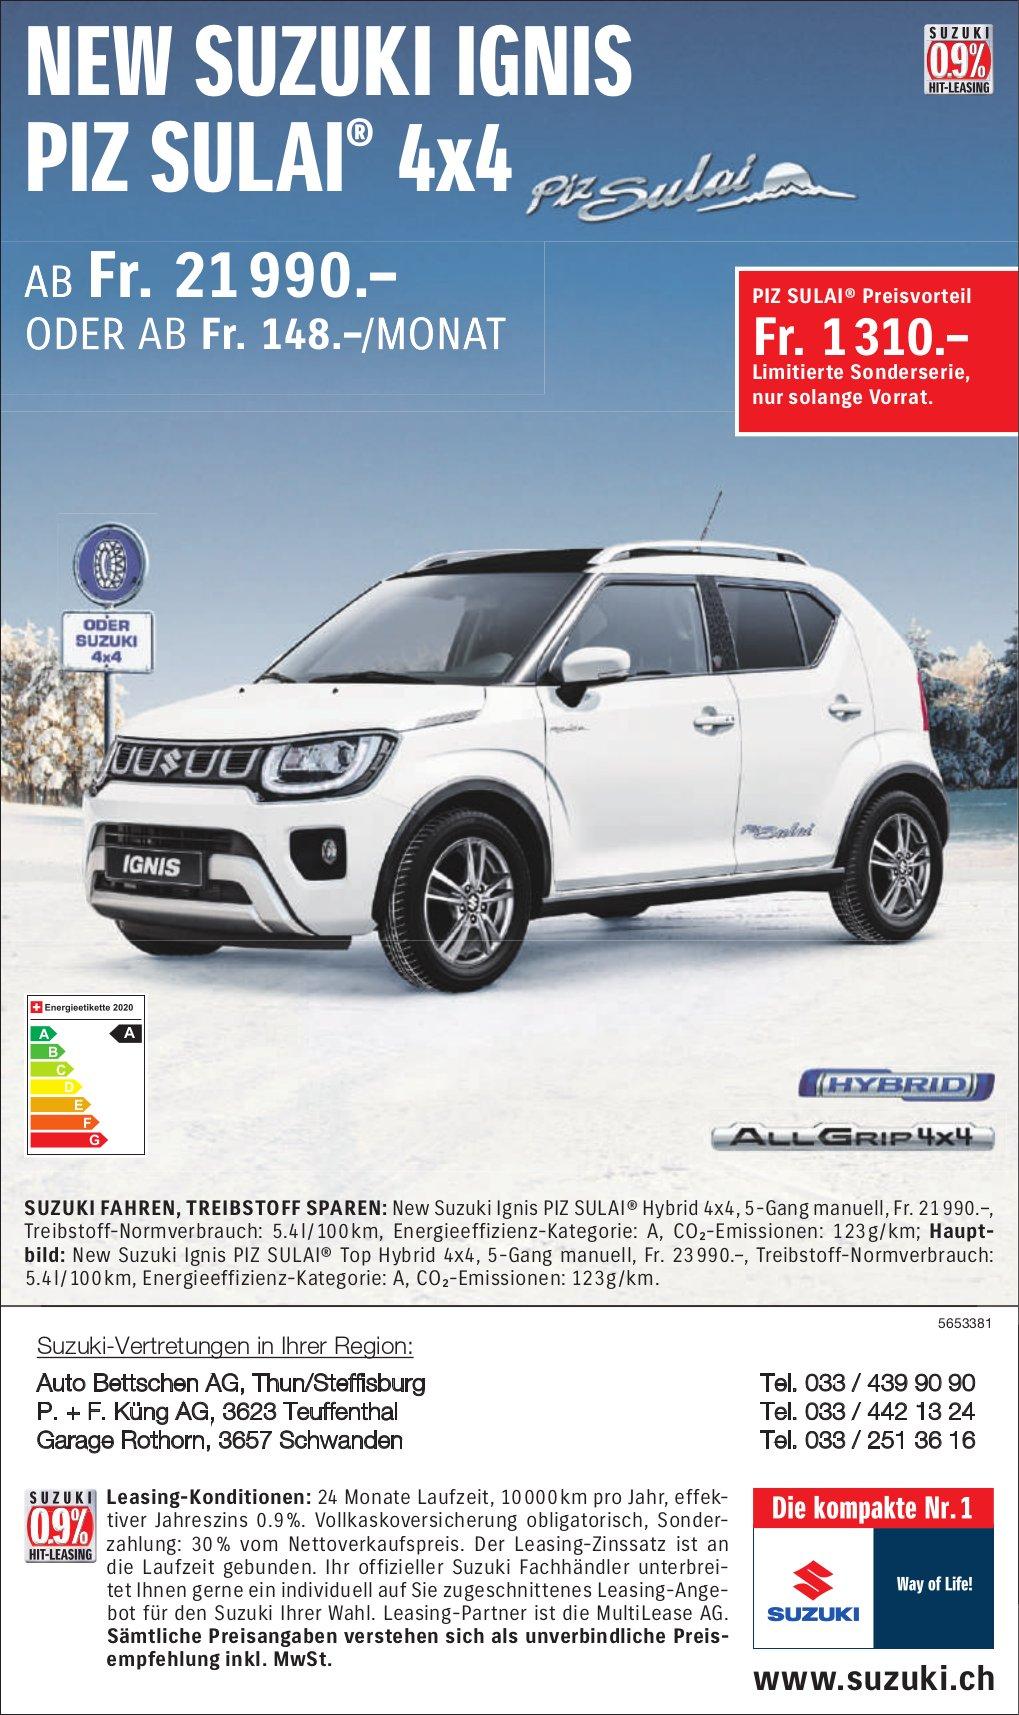 New Suzuki Ignis Piz Sulai® 4x4